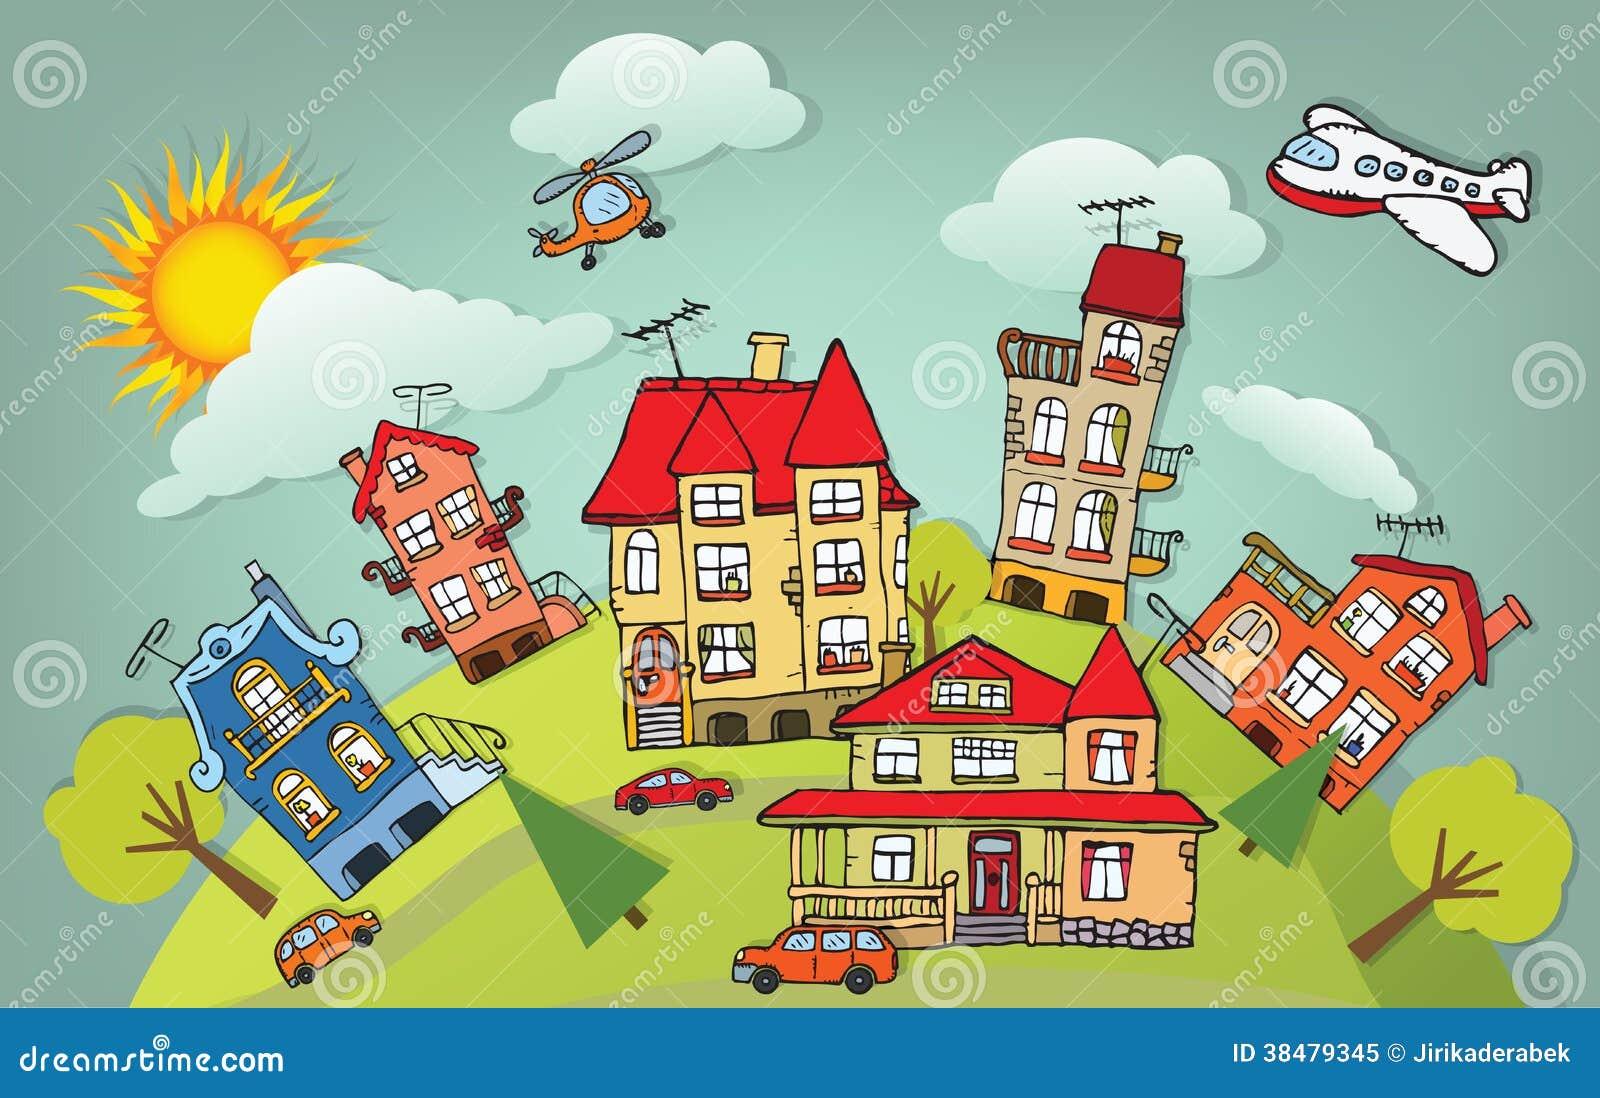 Cartoon City Stock Vector Image Of Life Building